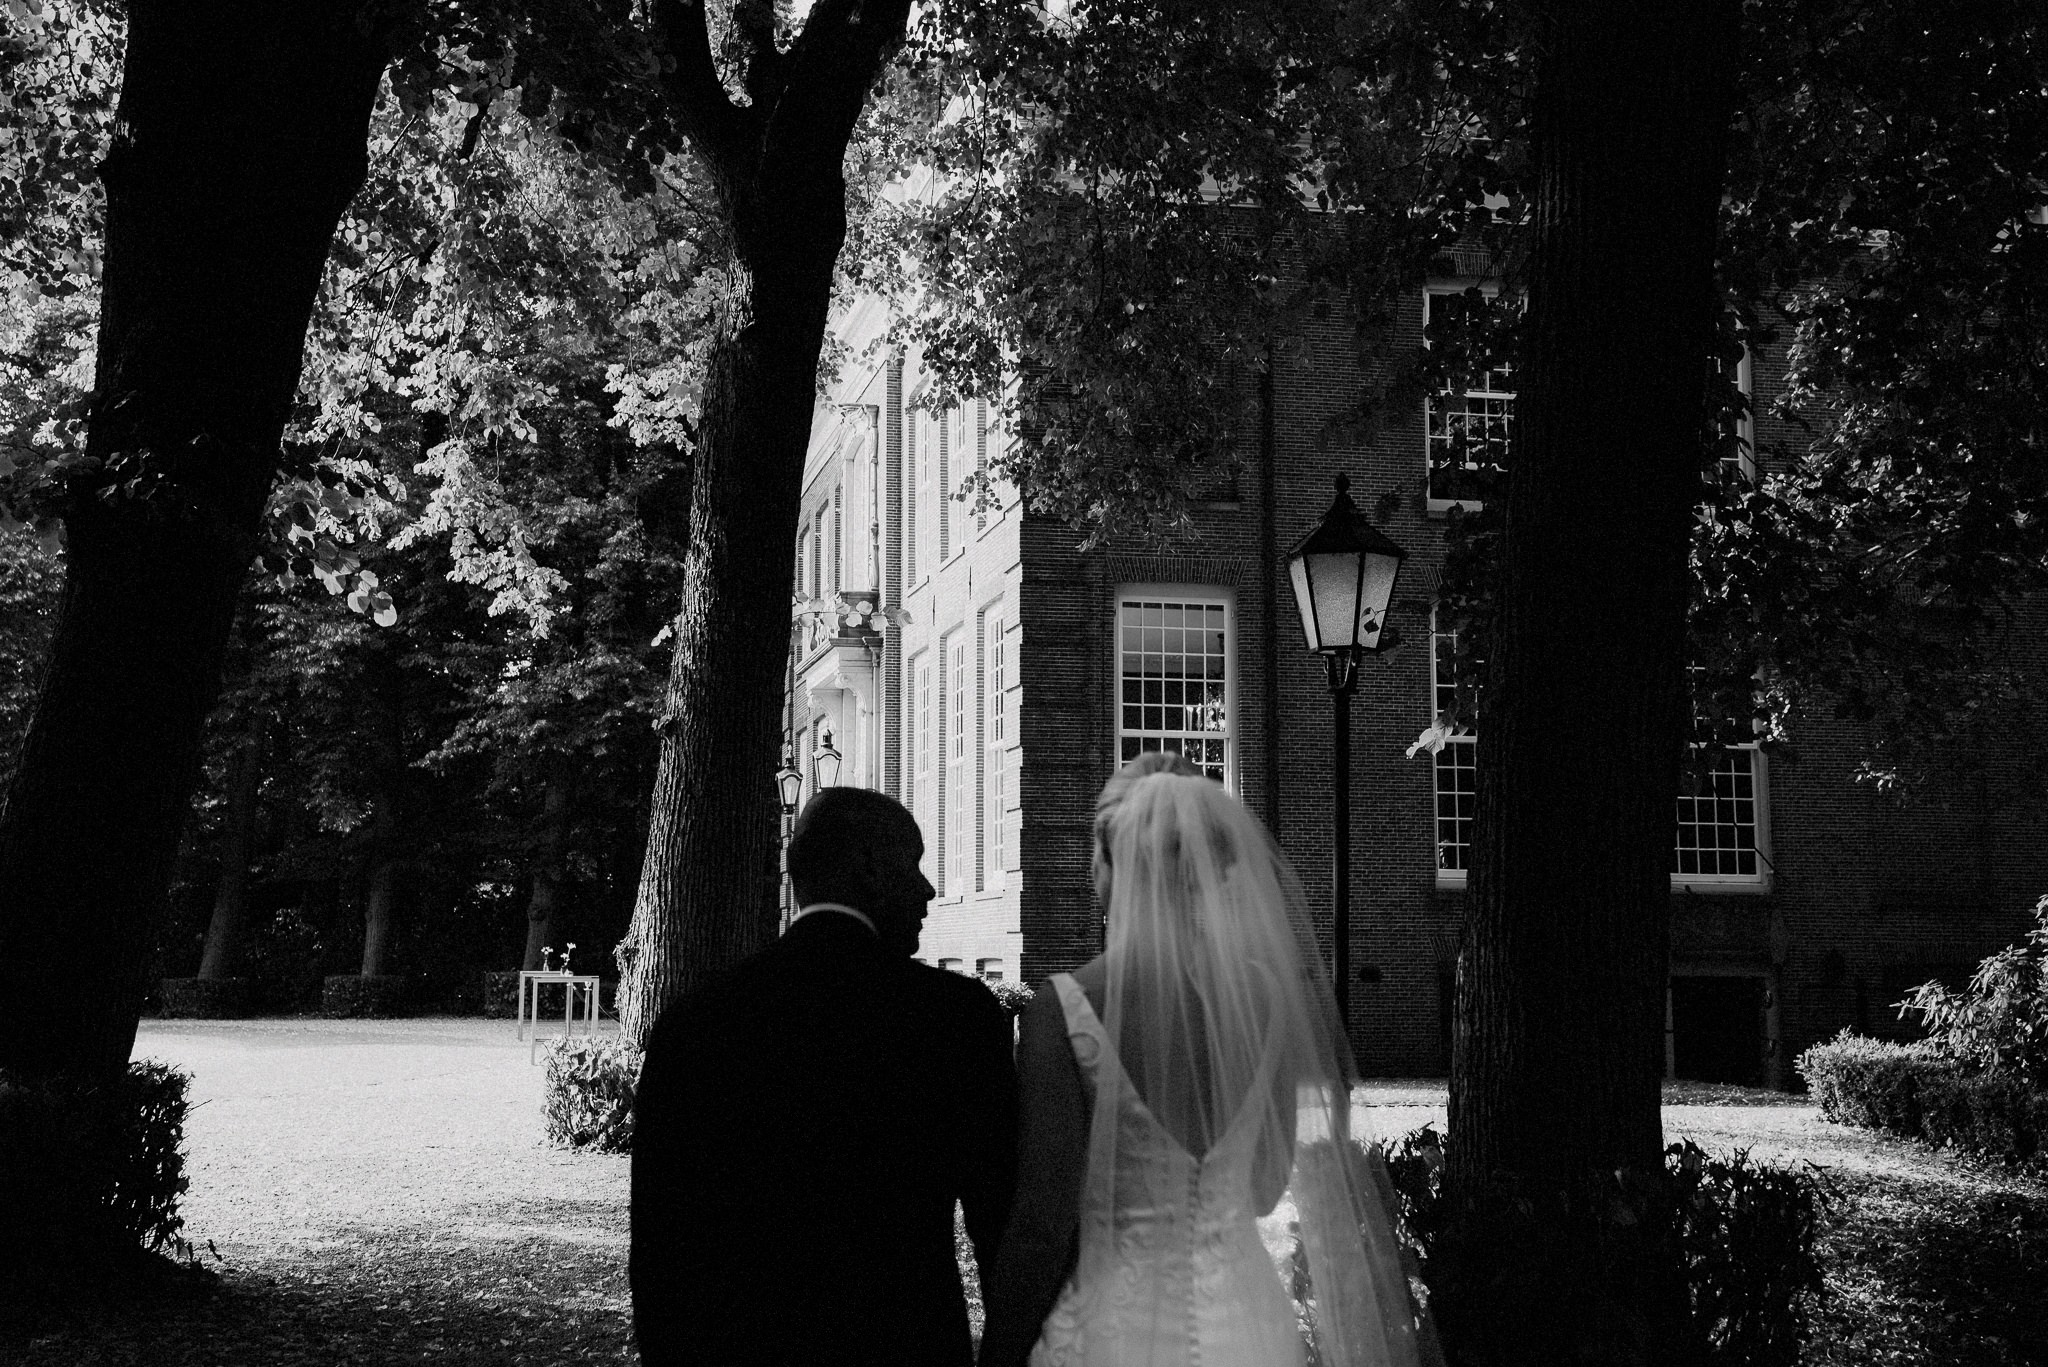 Bruidsfotografie Buitenplaats Sparrendaal - Naomi van der Kraan 0057.jpg